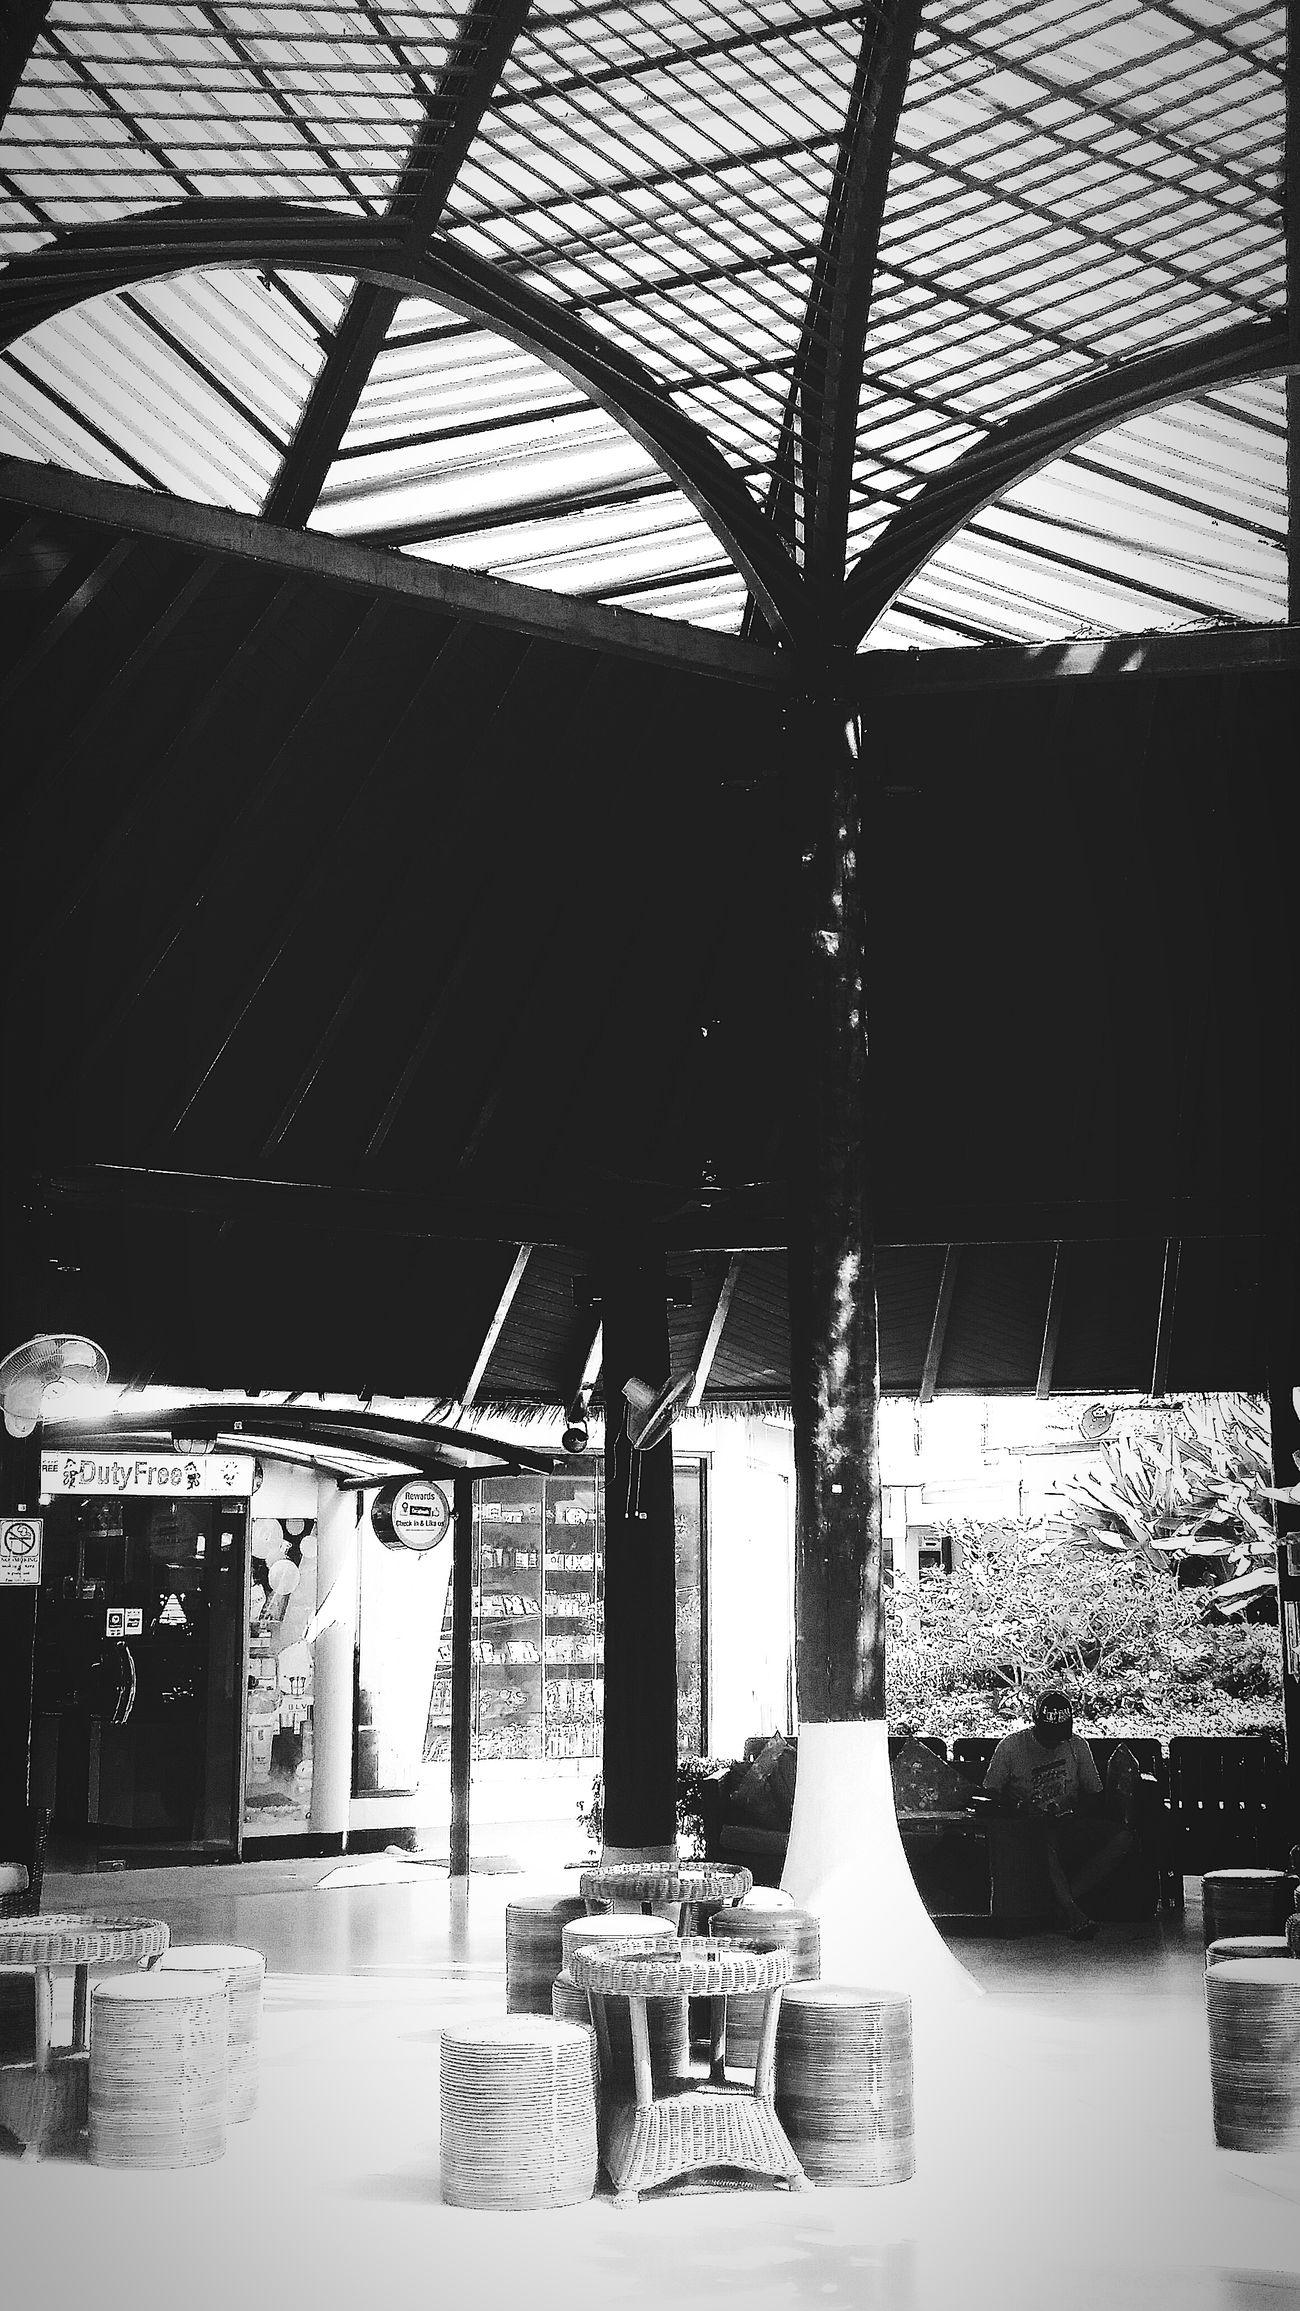 Koh Samui Airport Architecture Interior Travelphotography Bnw Bnw_life Bnw_travel Bnw_captures Bnw_world Bnw_kohsamui Bnw_thailand Bnwcollection Bnwphotography Eyeemcollection Eyeemphotography Eyeemthailand Eyeemkohsamui Eyeem Architecture